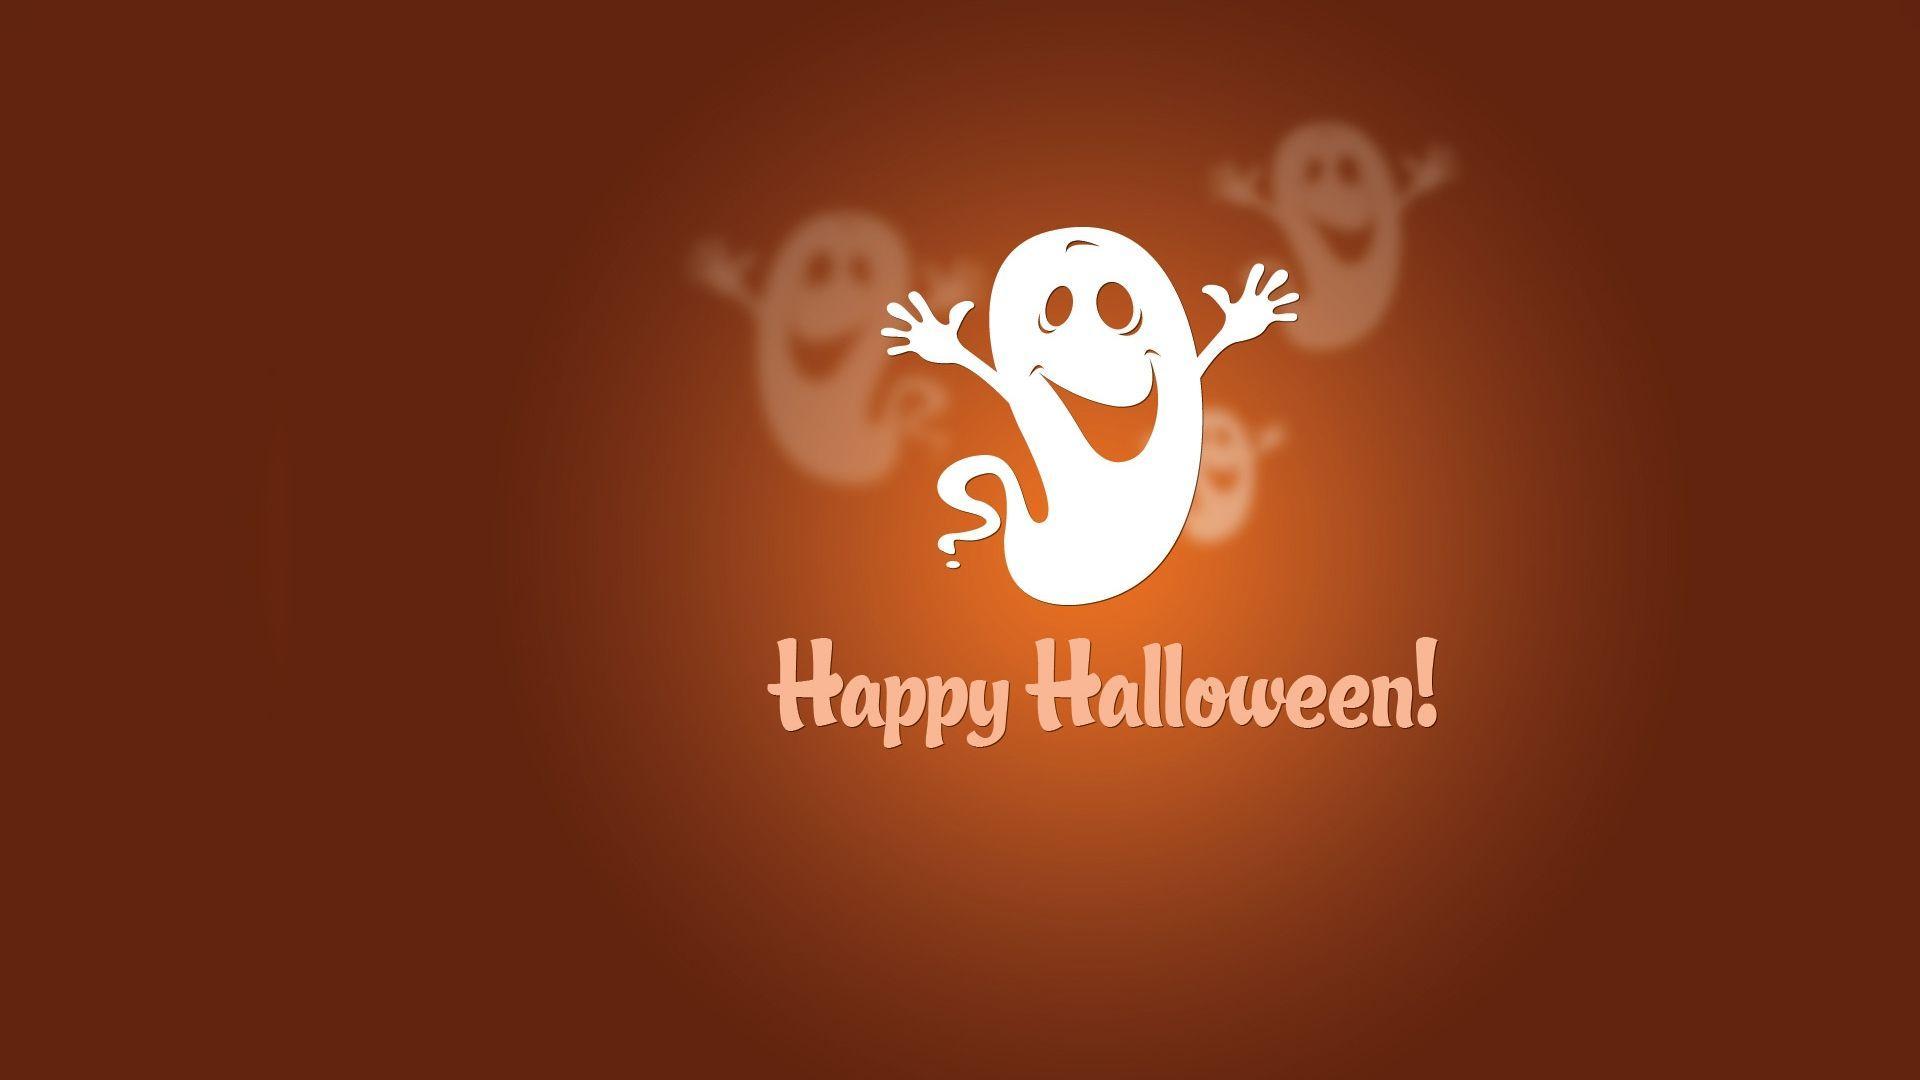 Cute Halloween Desktop Backgrounds  Wallpaper Cave